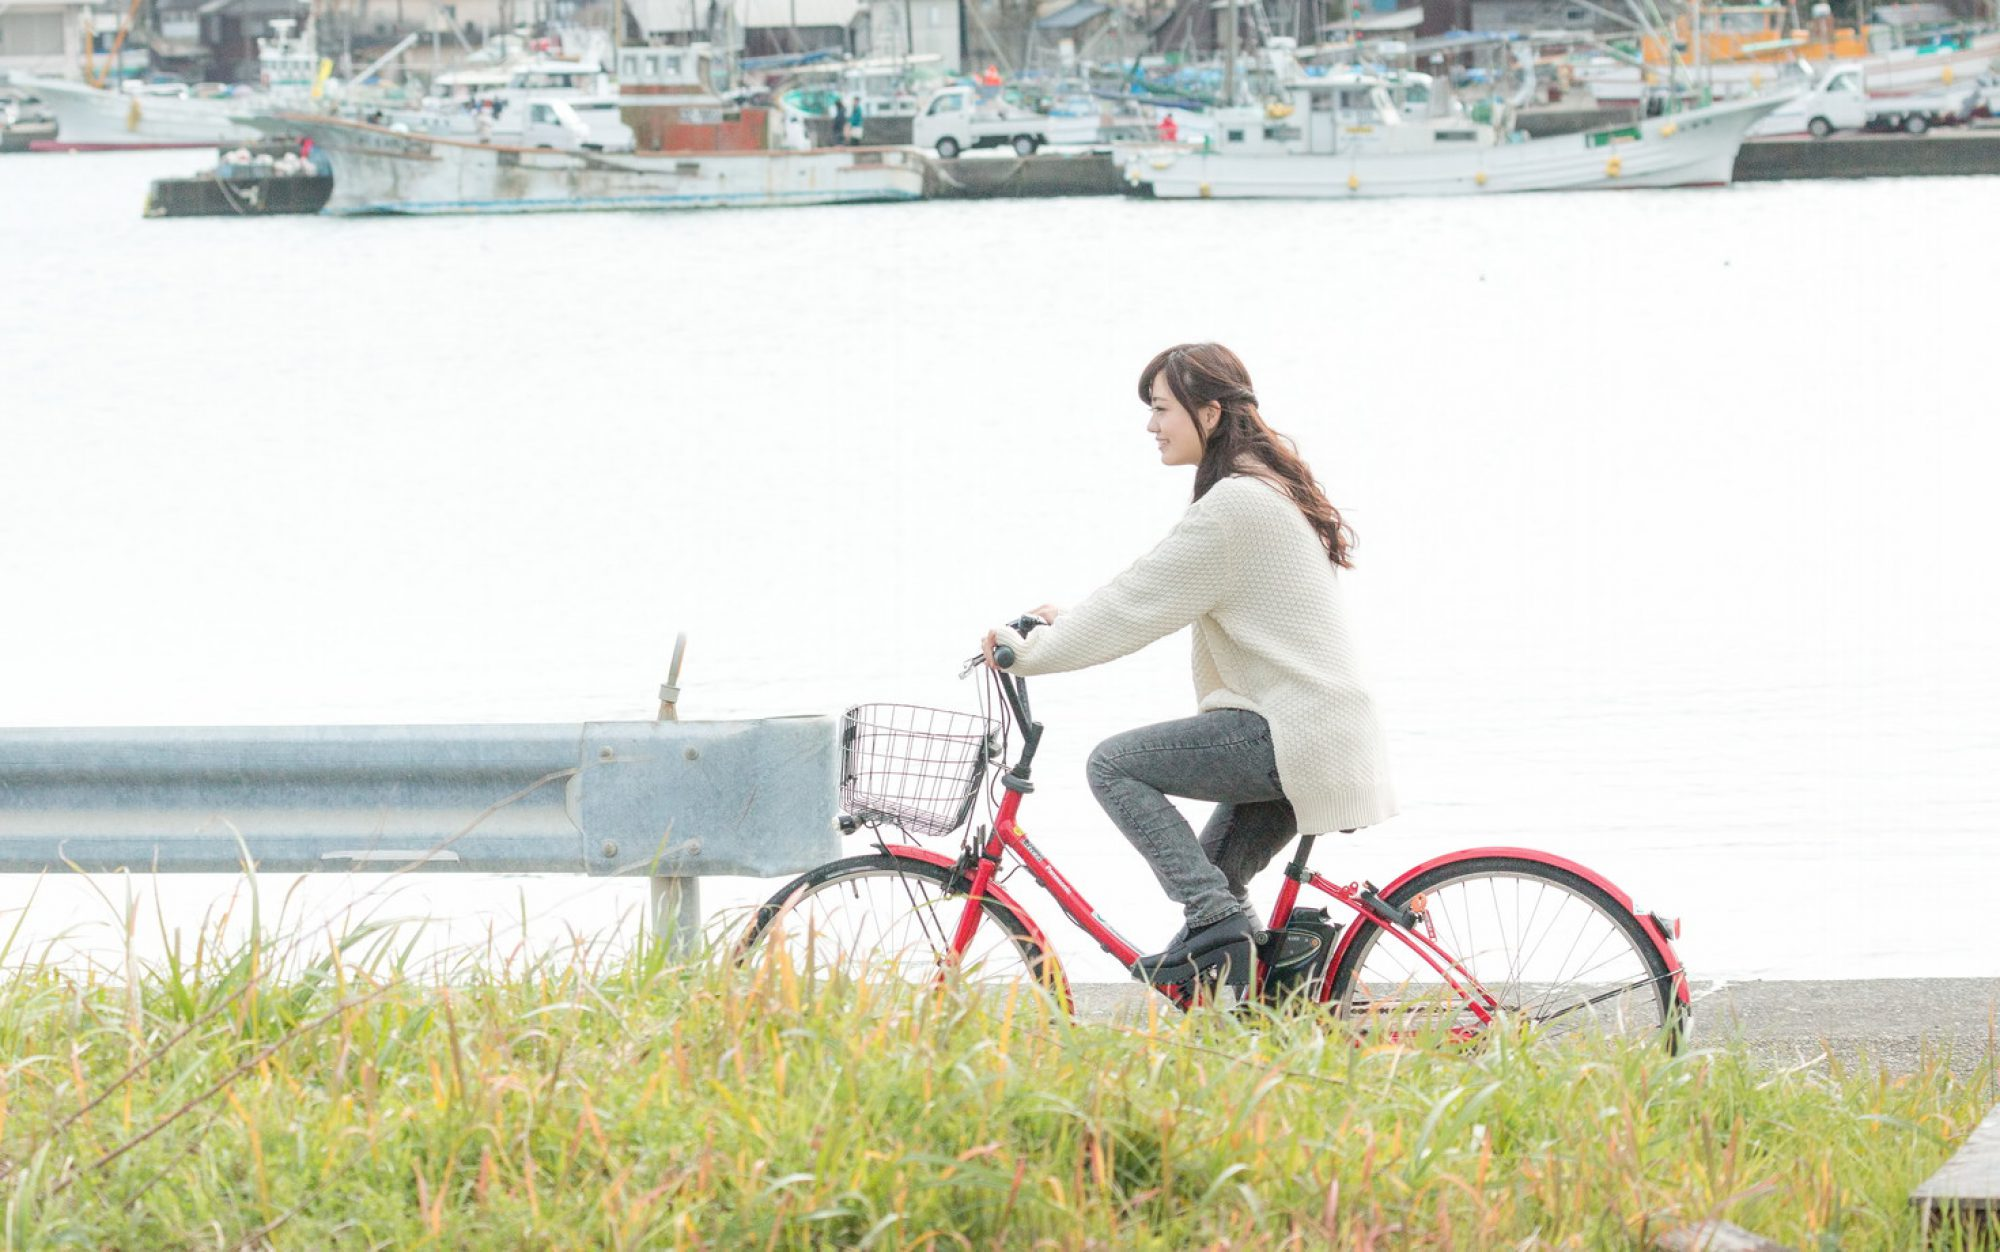 Key-West Cycle 自転車のキーウエスト